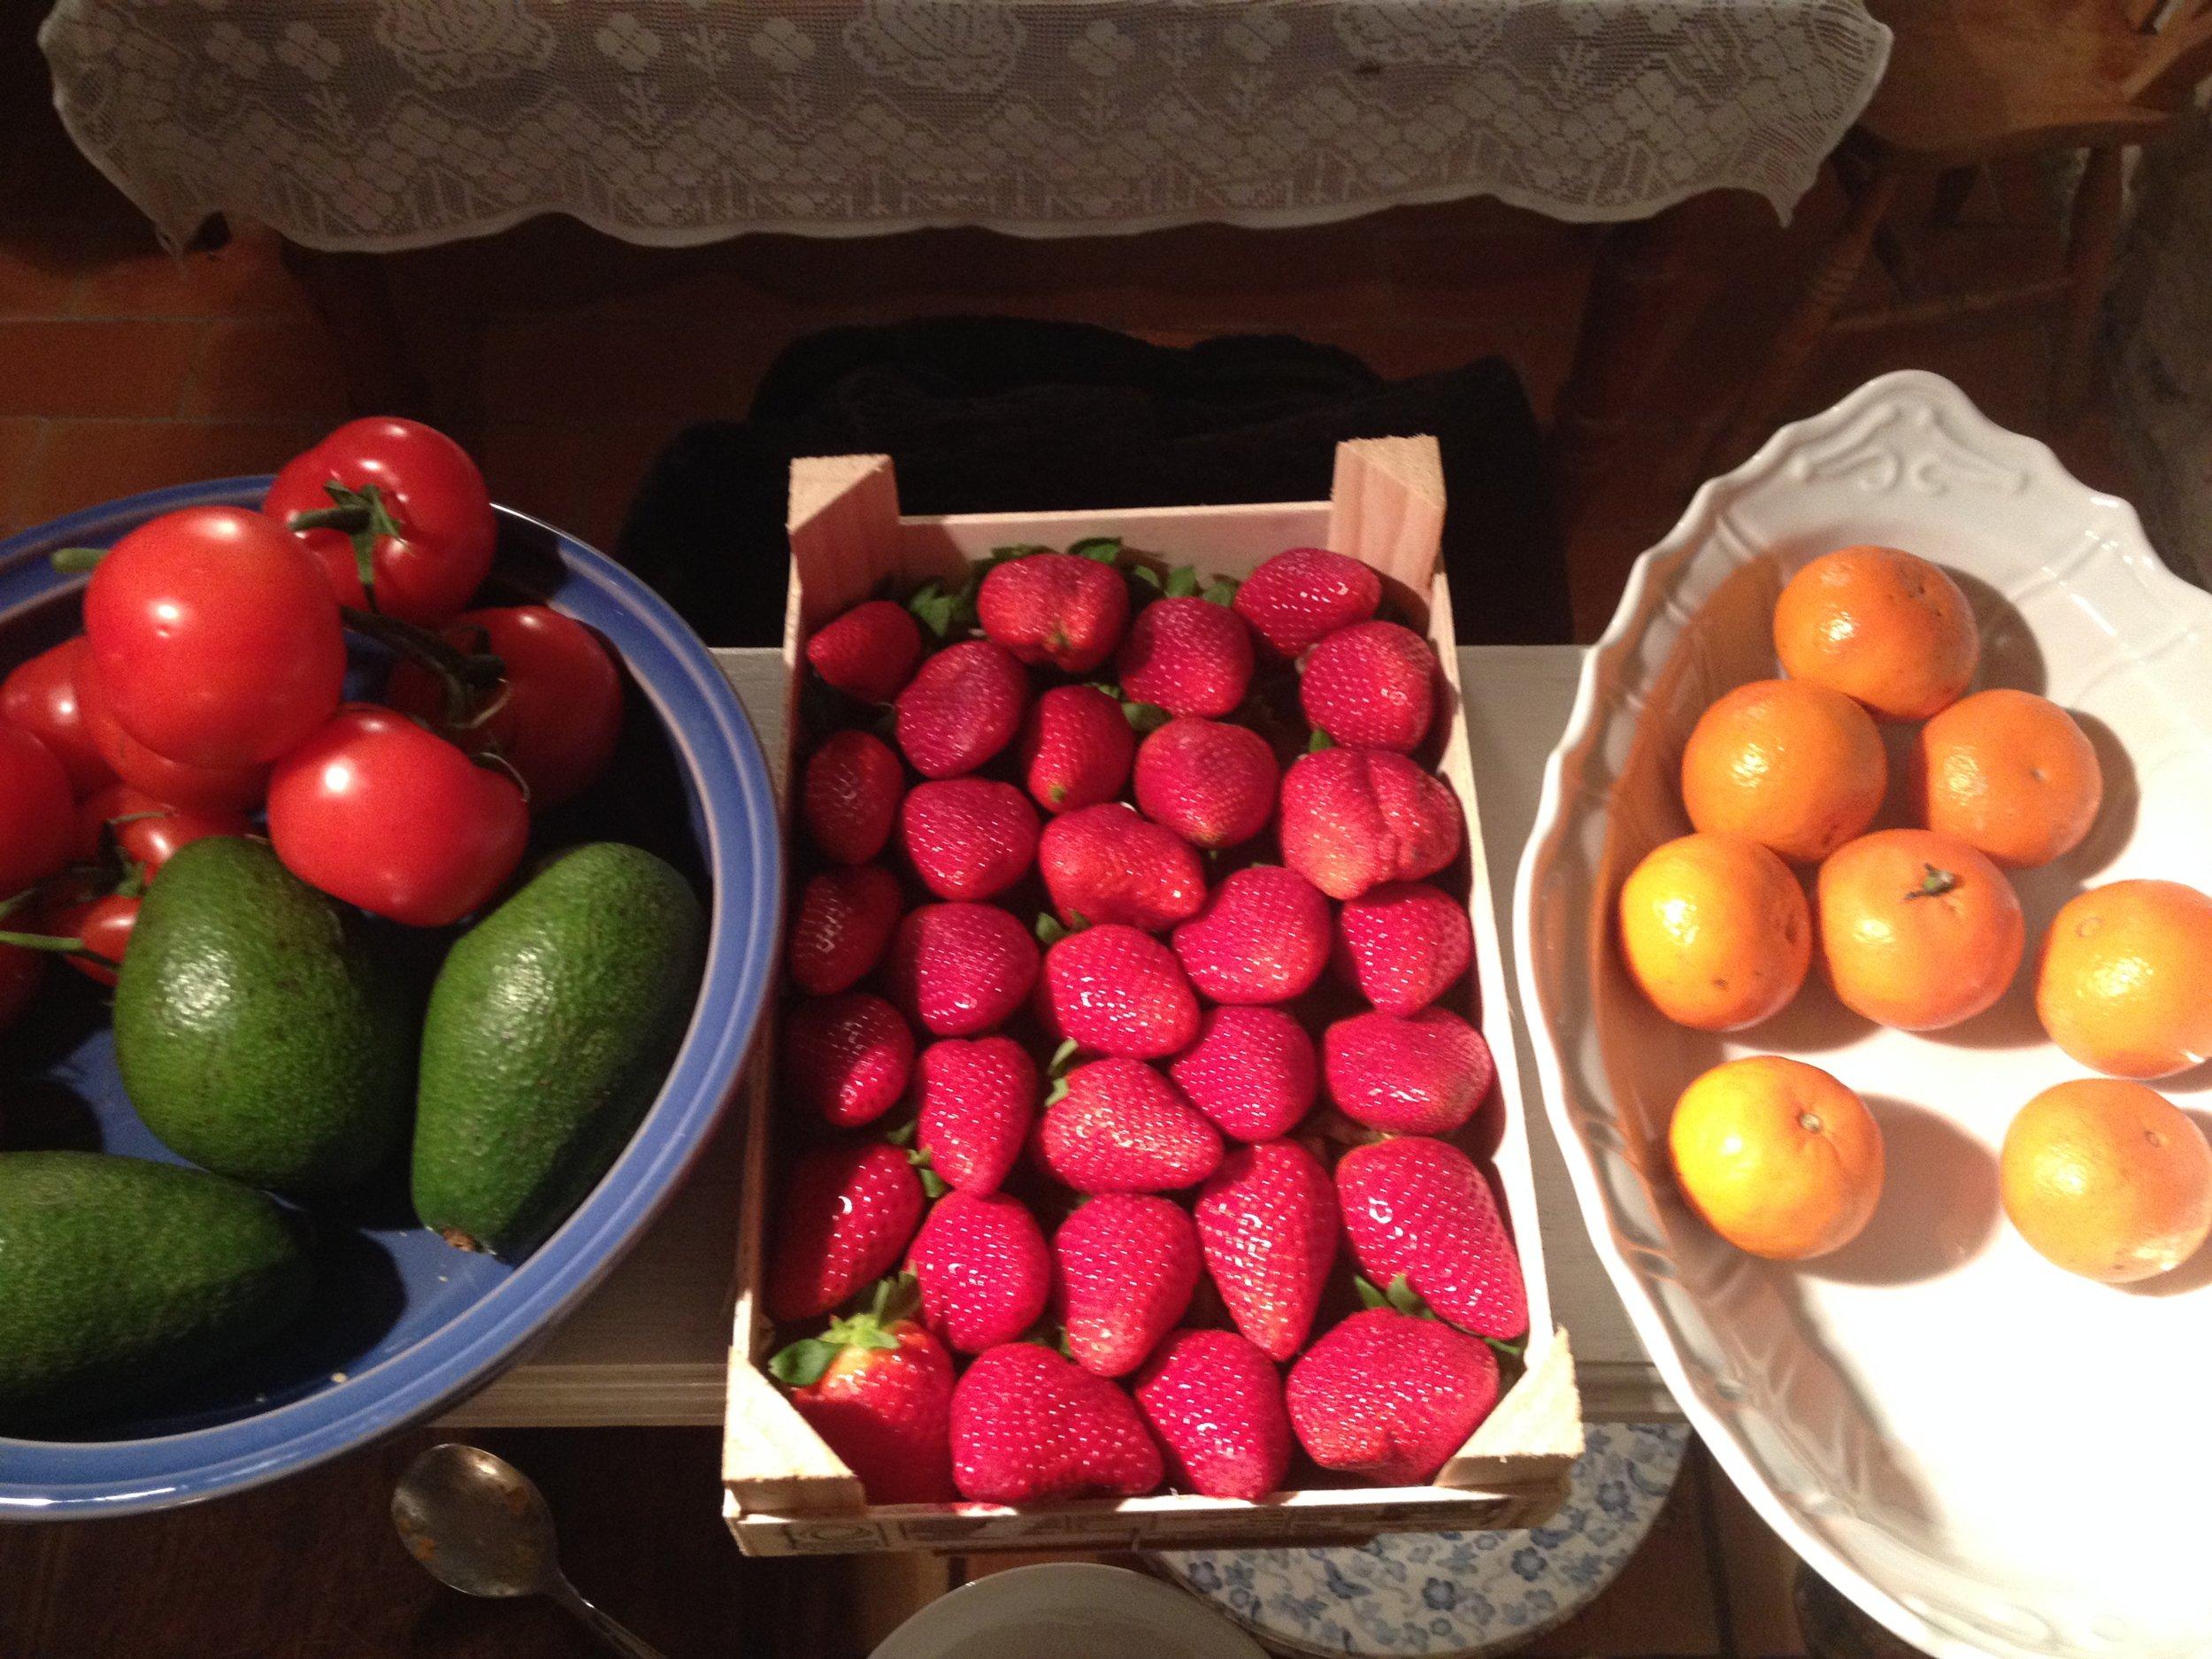 A glorious cornucopia of colour in the kitchen!